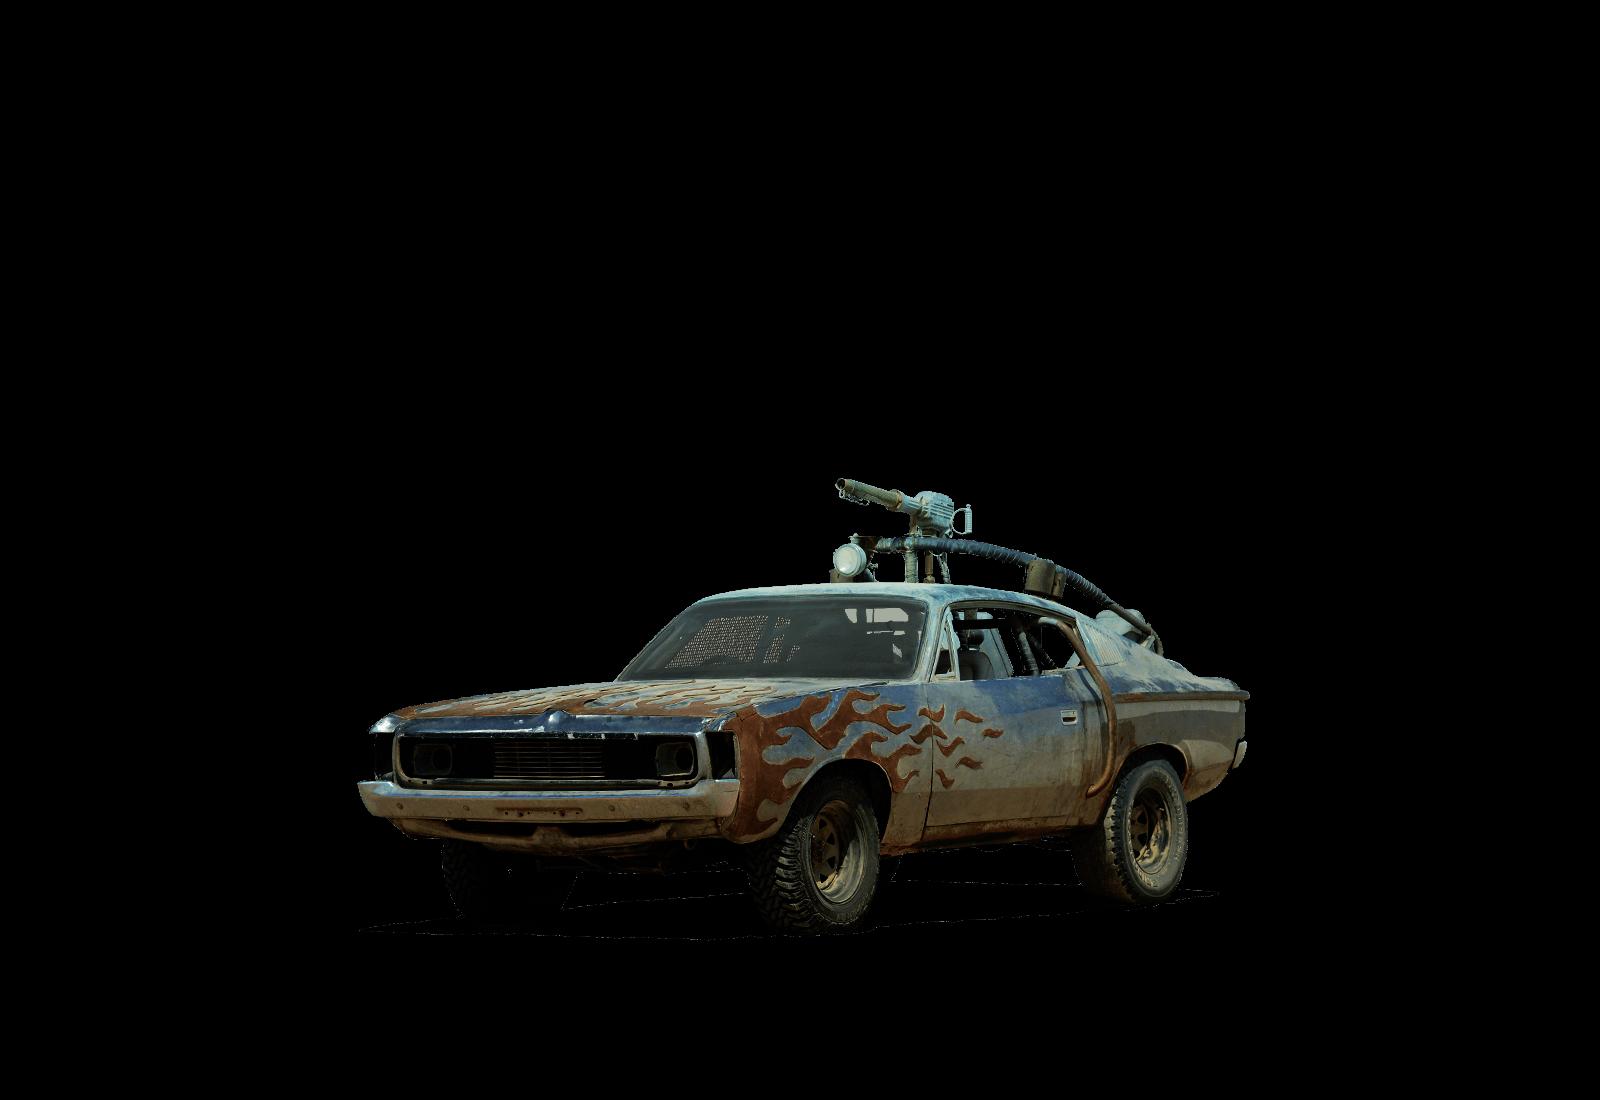 Mad Max Fury Road Vehicle Showcase Site Mad Max Fury Road Mad Max Fury Road